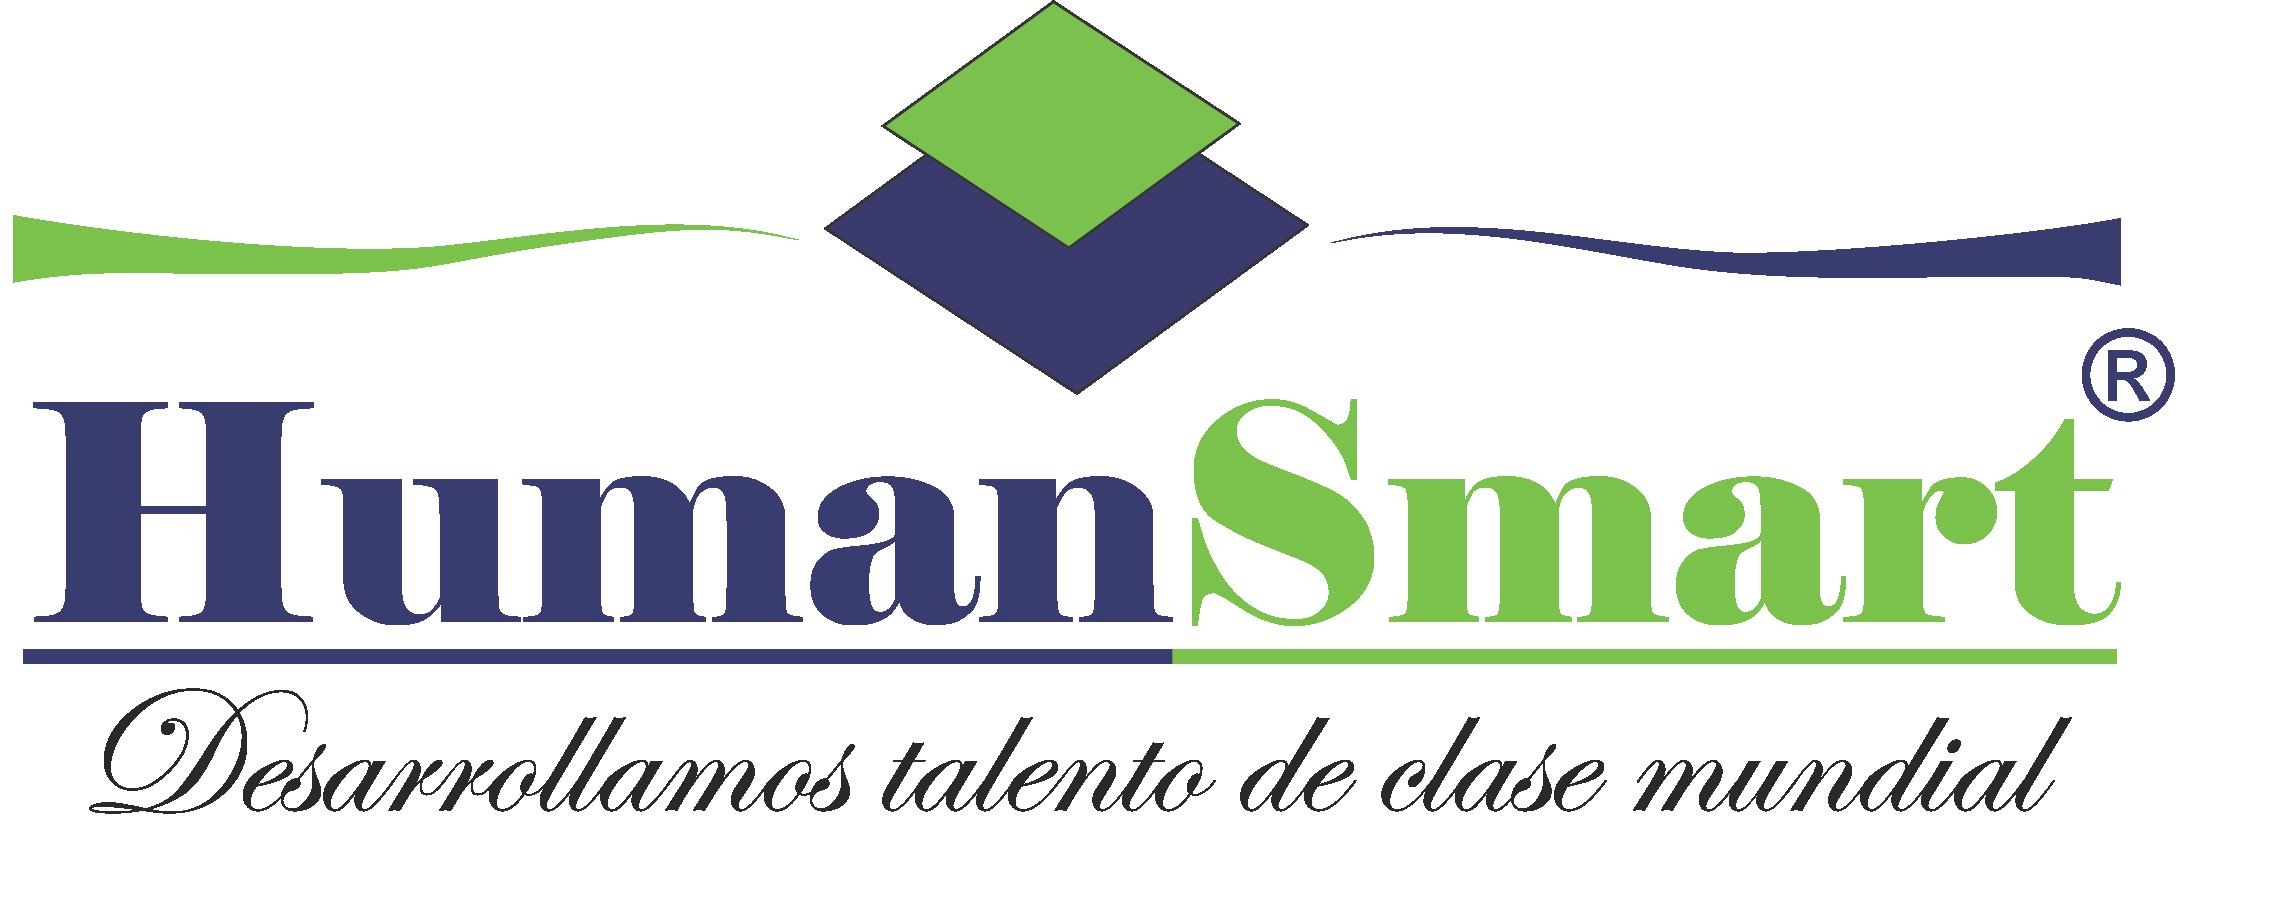 Perfil de RYS HumanSmart Consulting